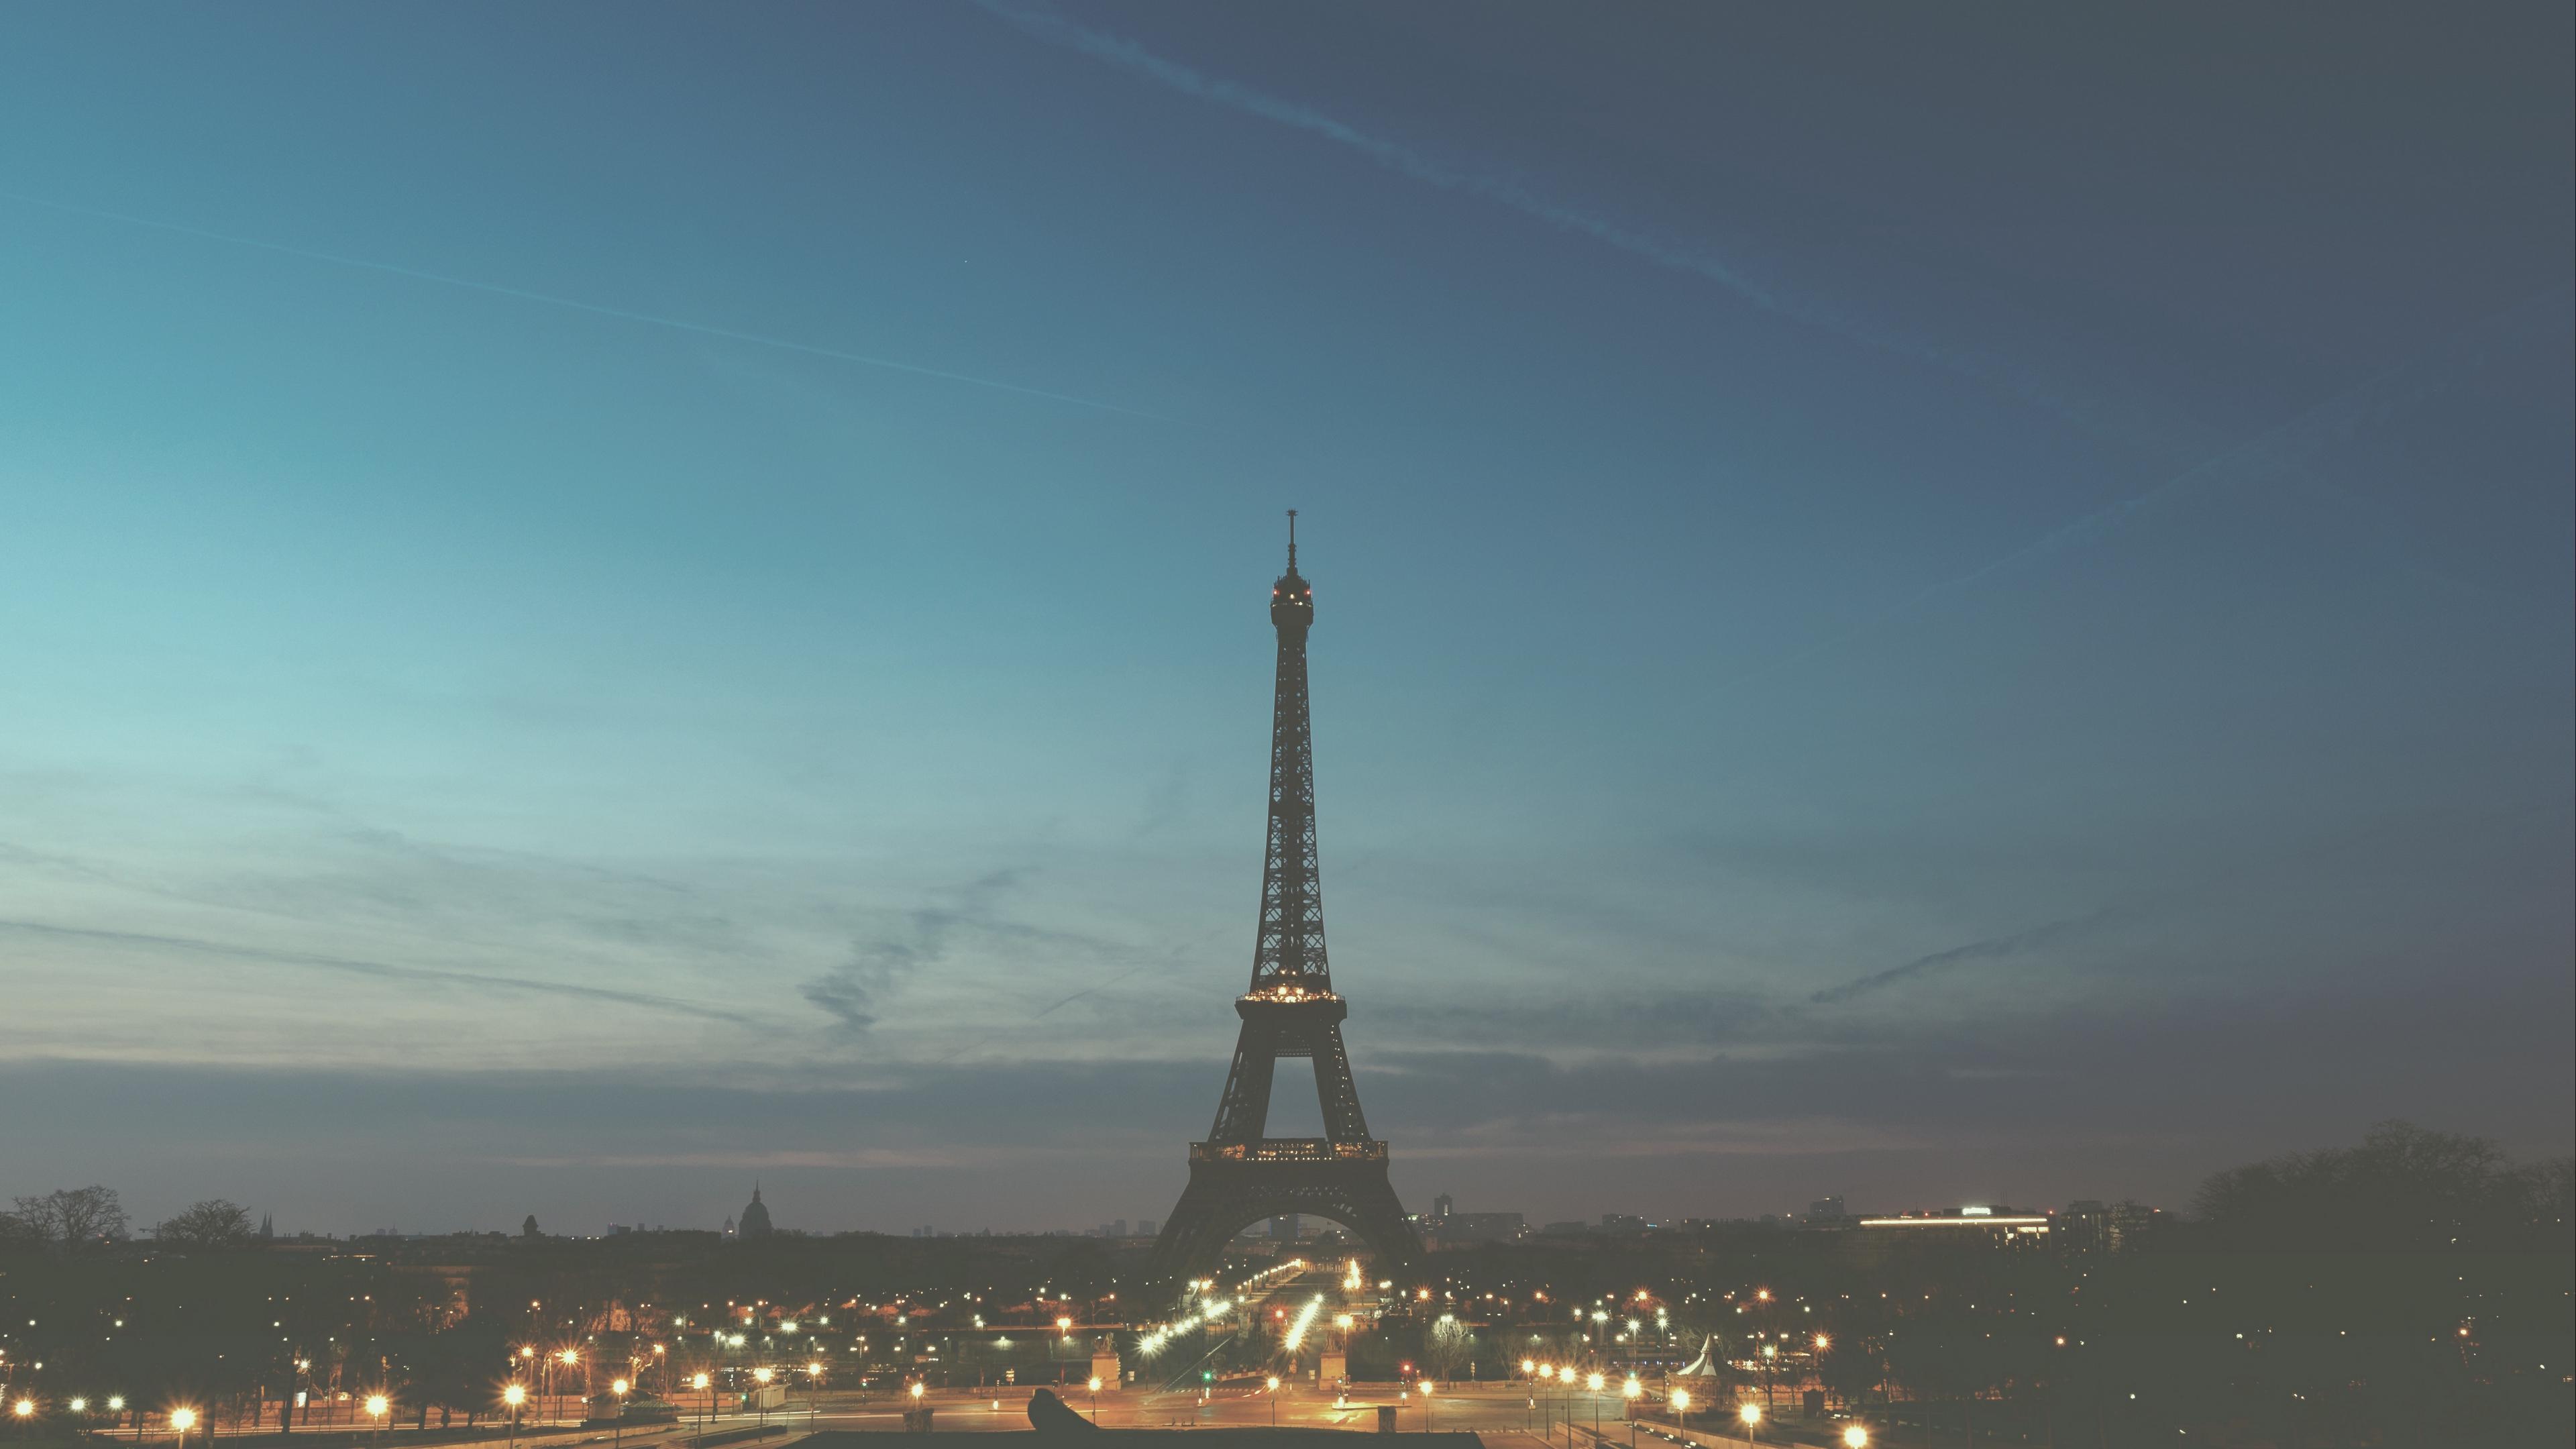 eiffel tower paris night 4k 1538064829 - eiffel tower, paris, night 4k - Paris, Night, eiffel tower